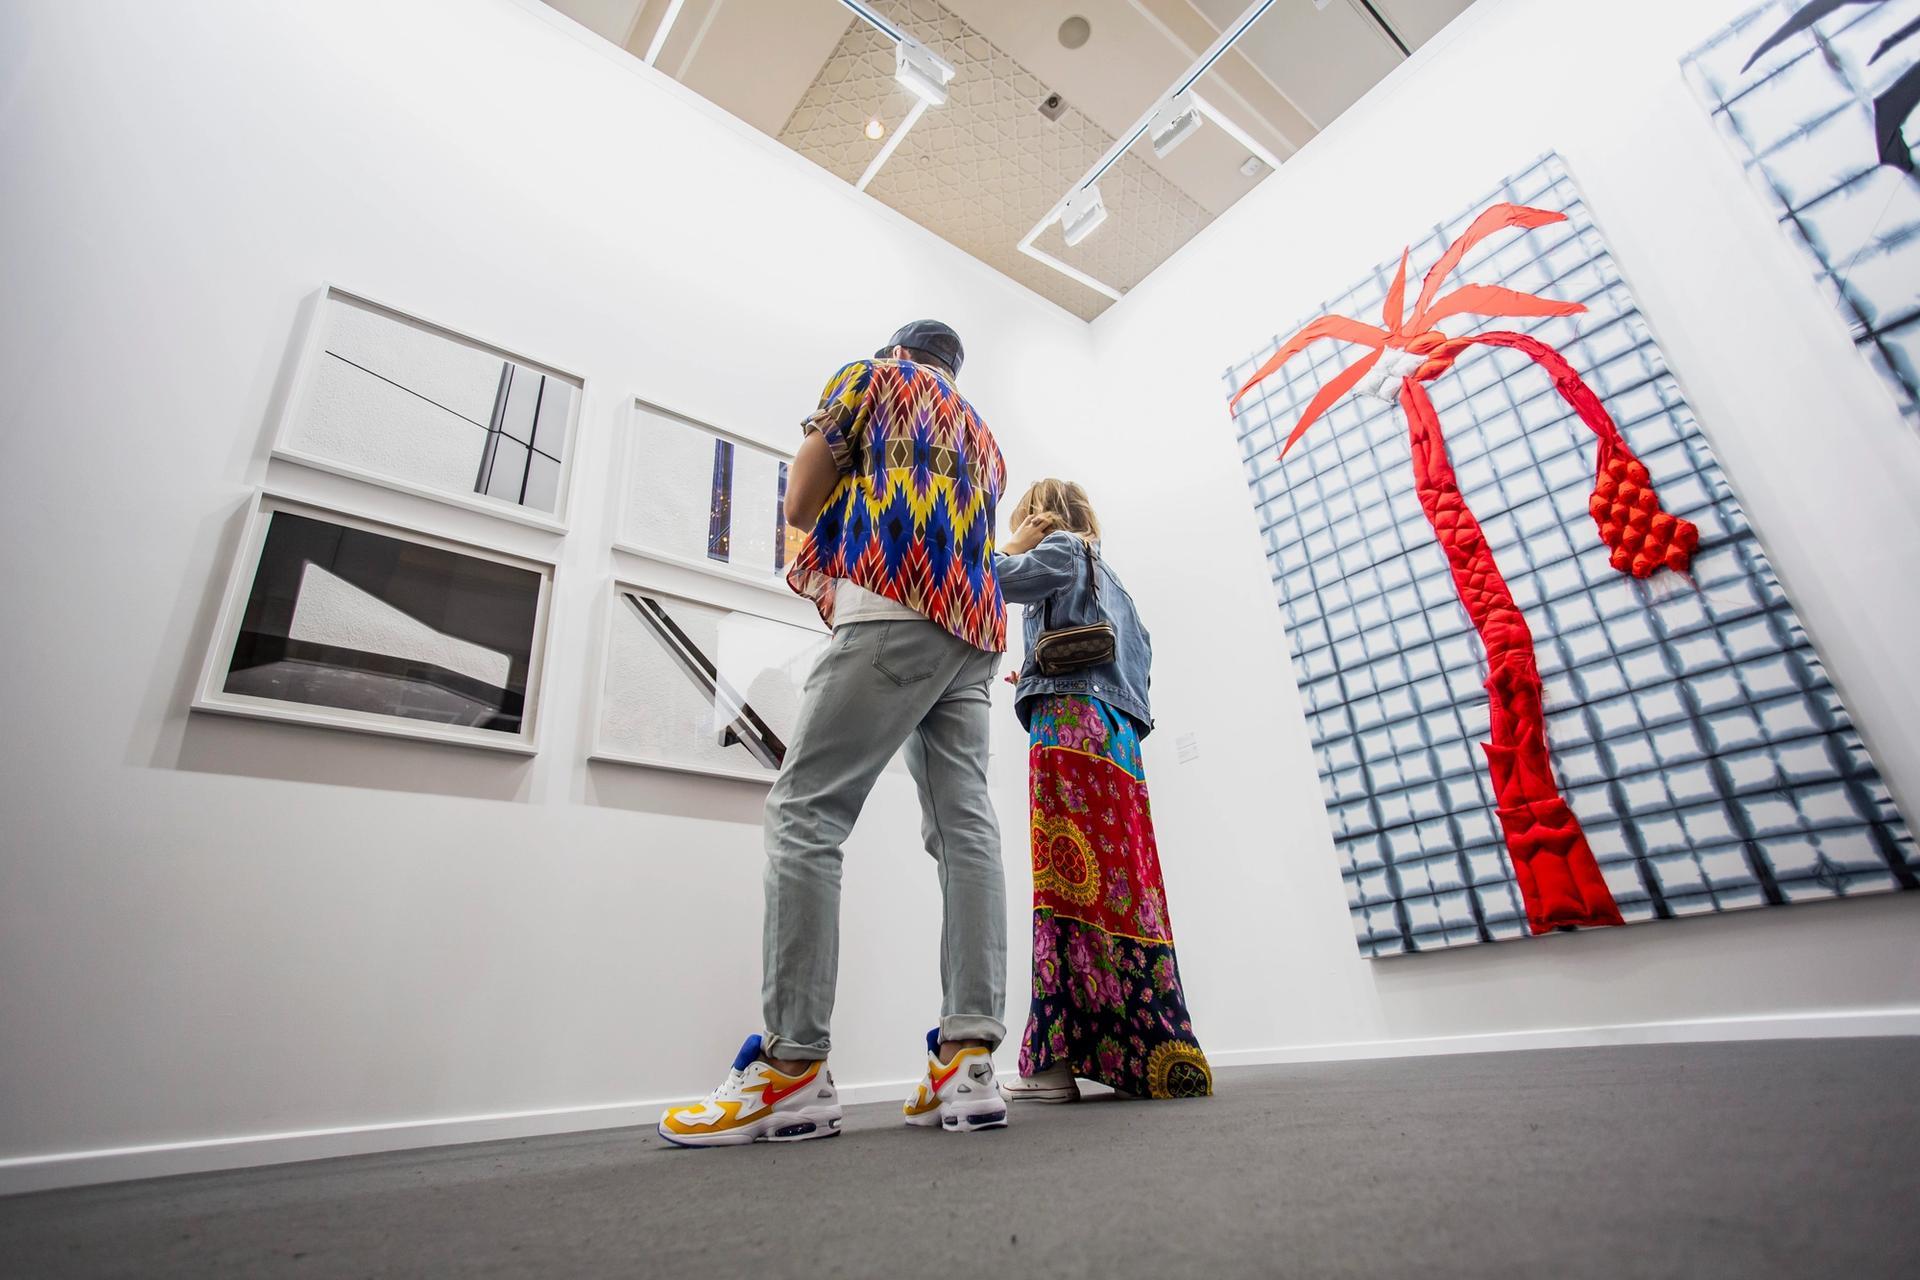 Isabelle van den Eynde gallery at Art Dubai in 2019 Courtesy of Photo Solutions